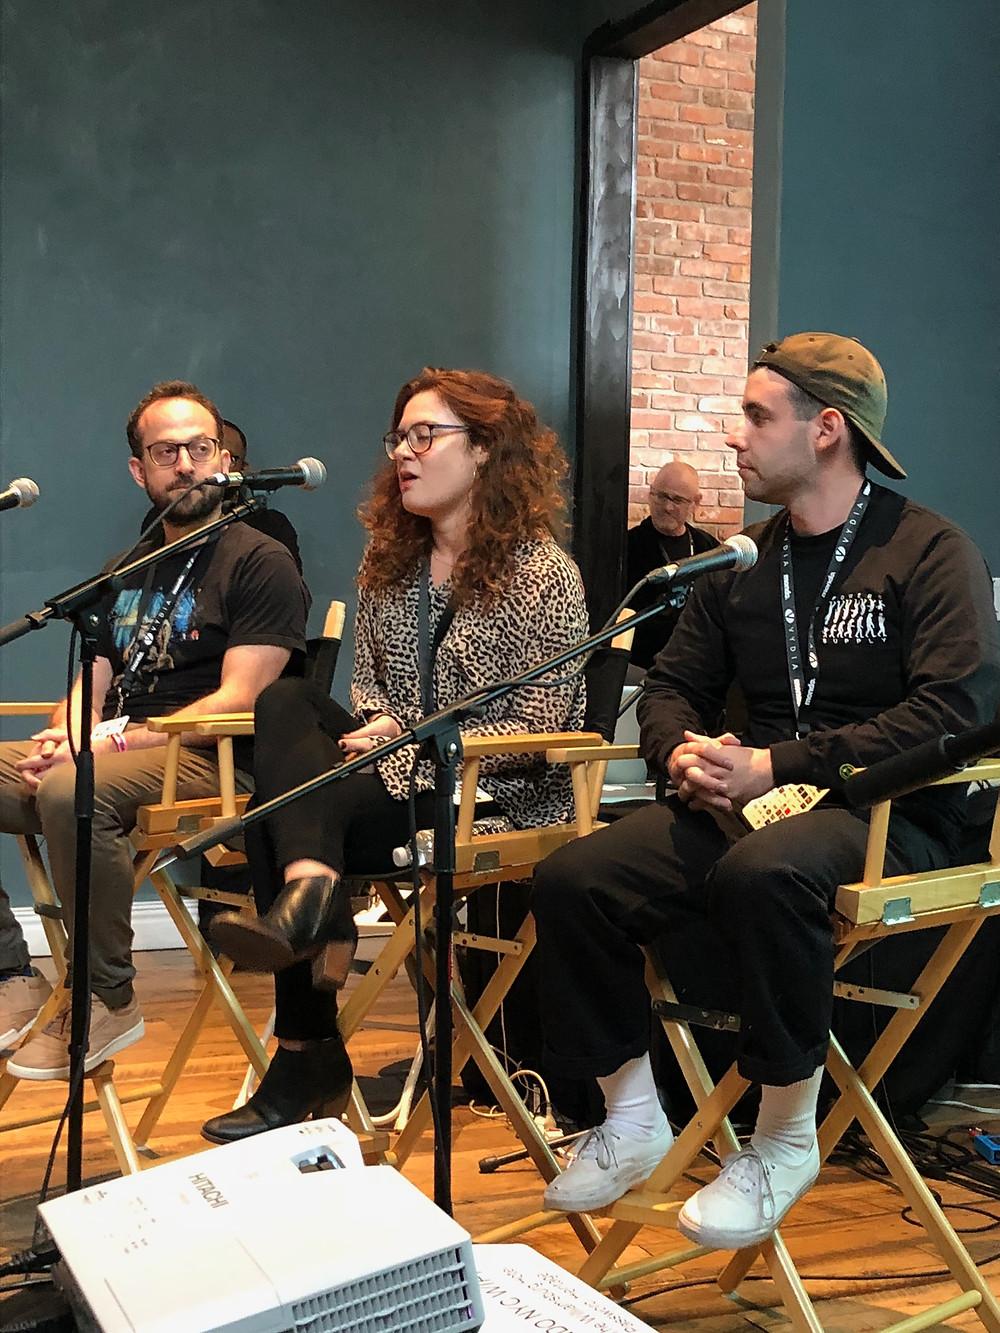 Ad Agencies & The In House Music Supervisors/Agencies  Dan Gross-McCann Erickson/Music Producer  Rachel Rauch-Publicis  Music Producer  Ben Dorenfeld-Anomaly music Producer